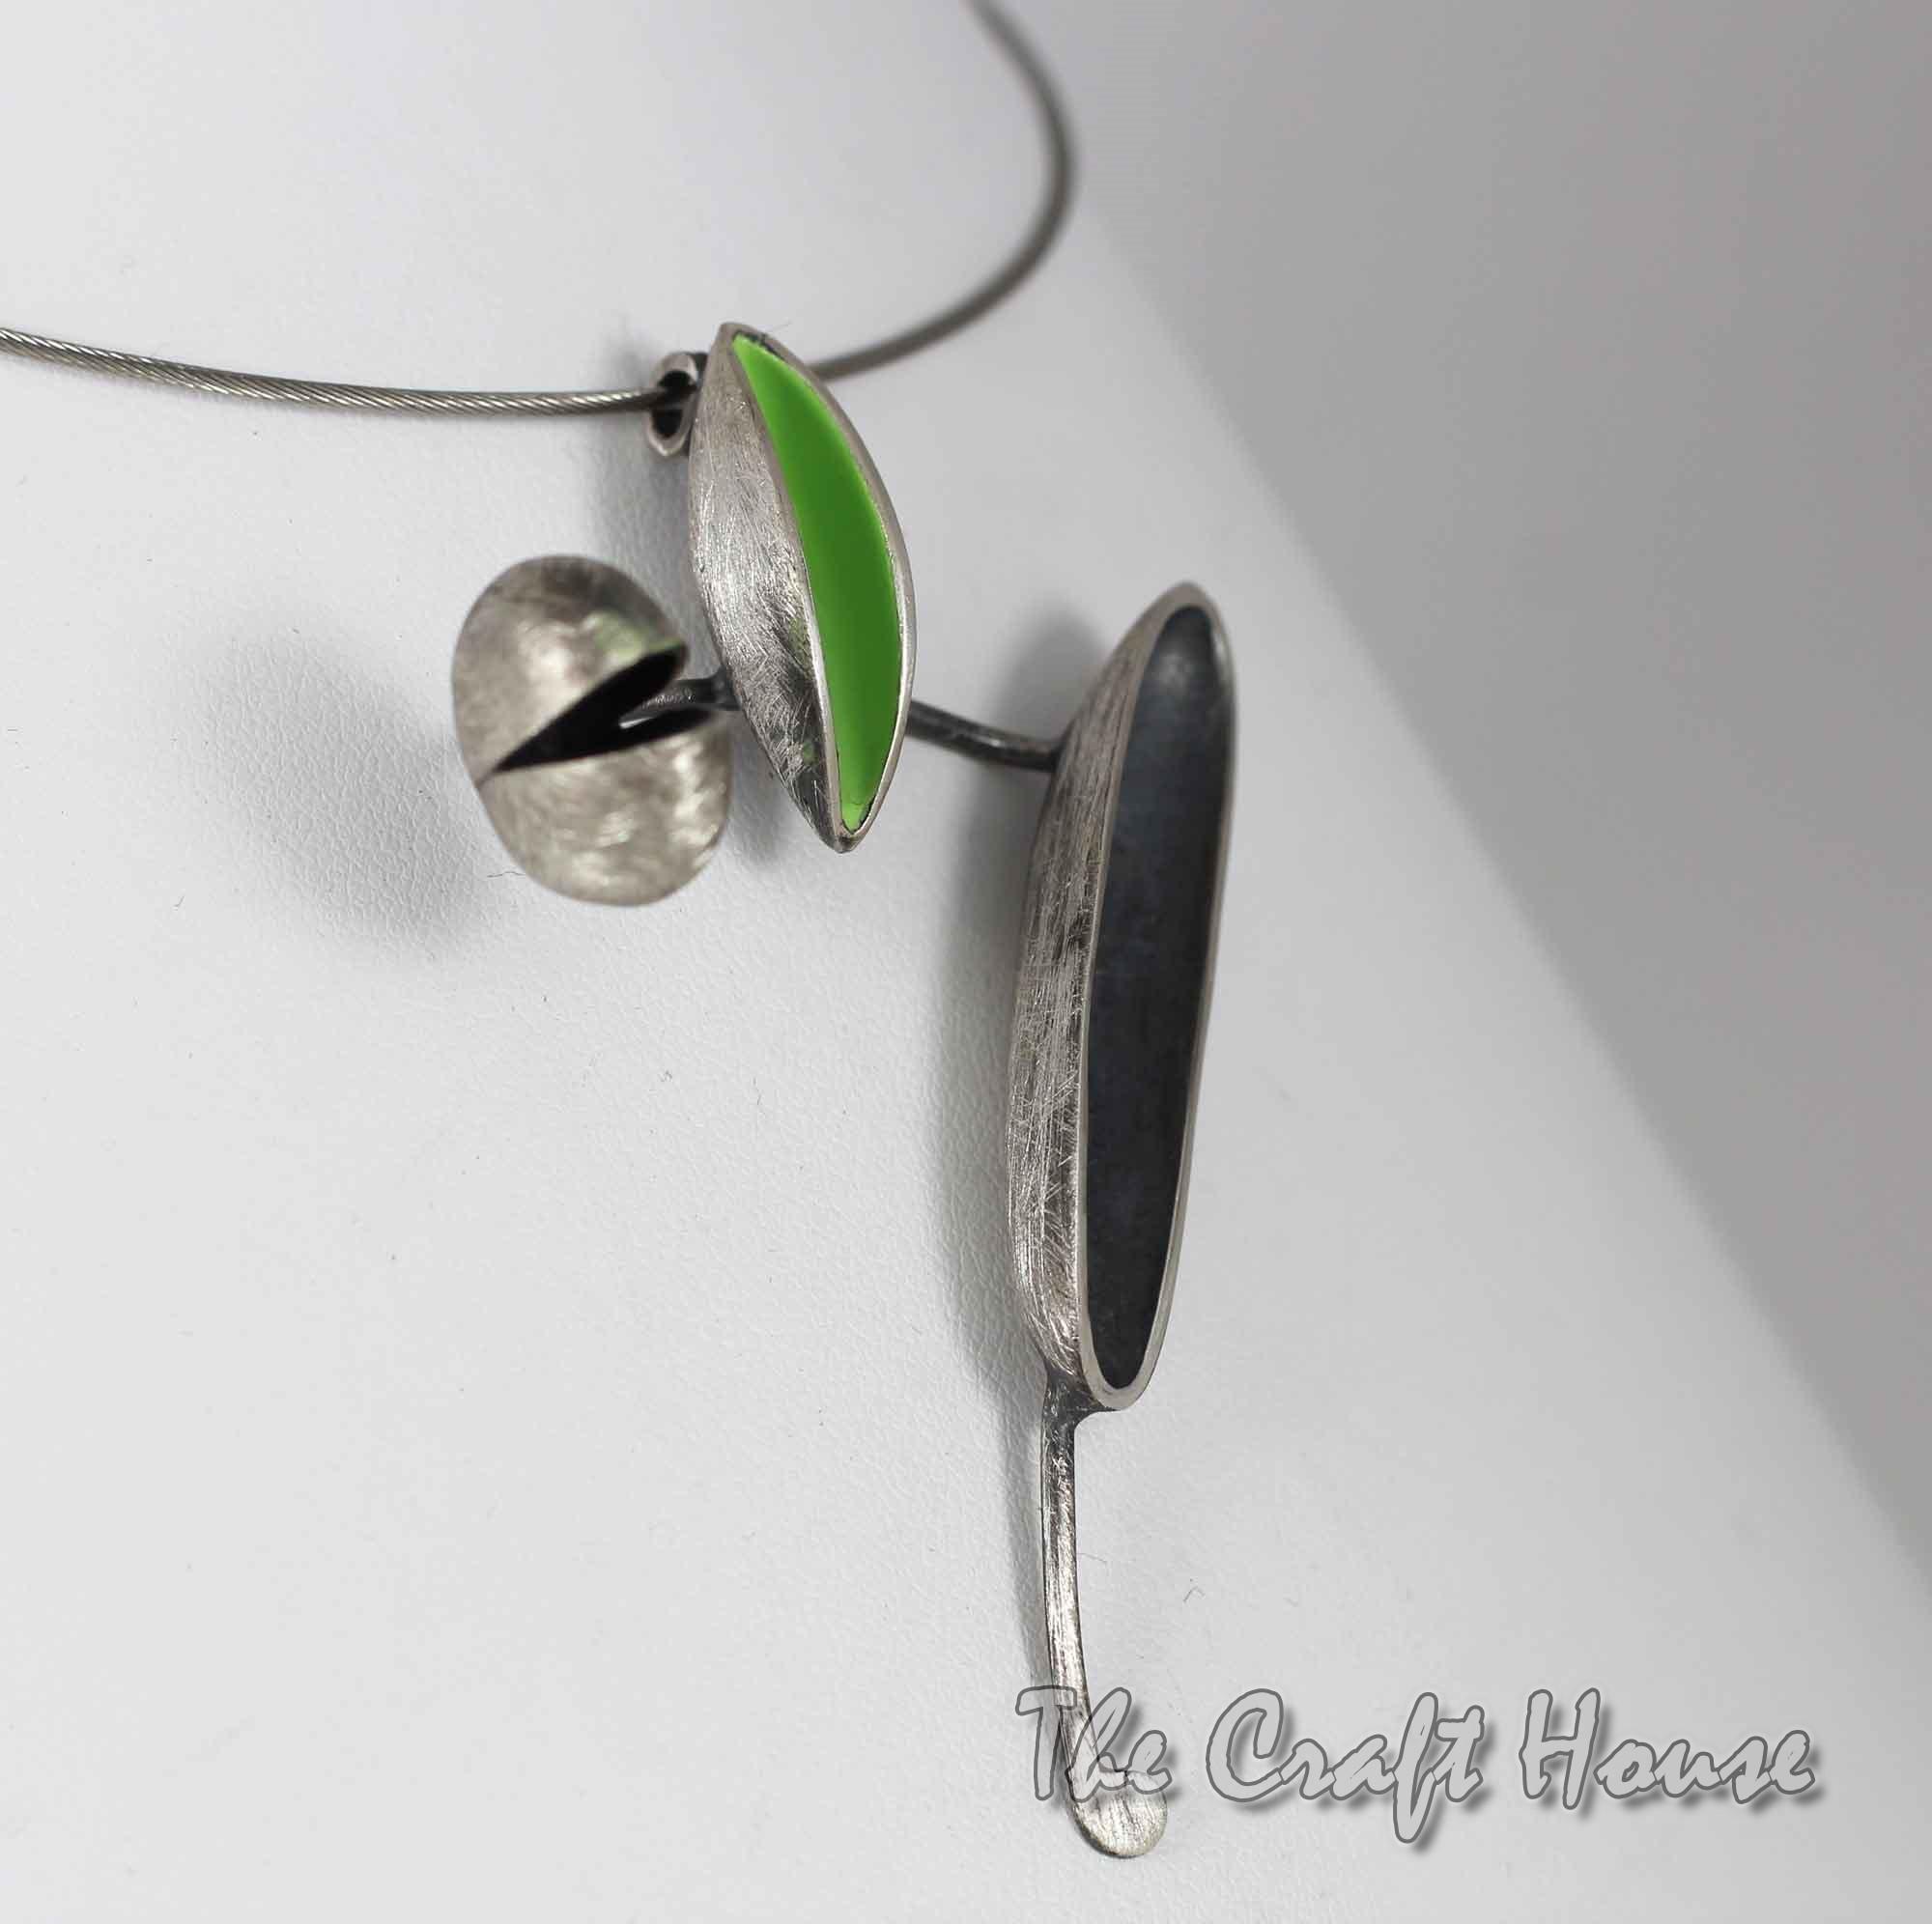 Silver necklace with color enamel